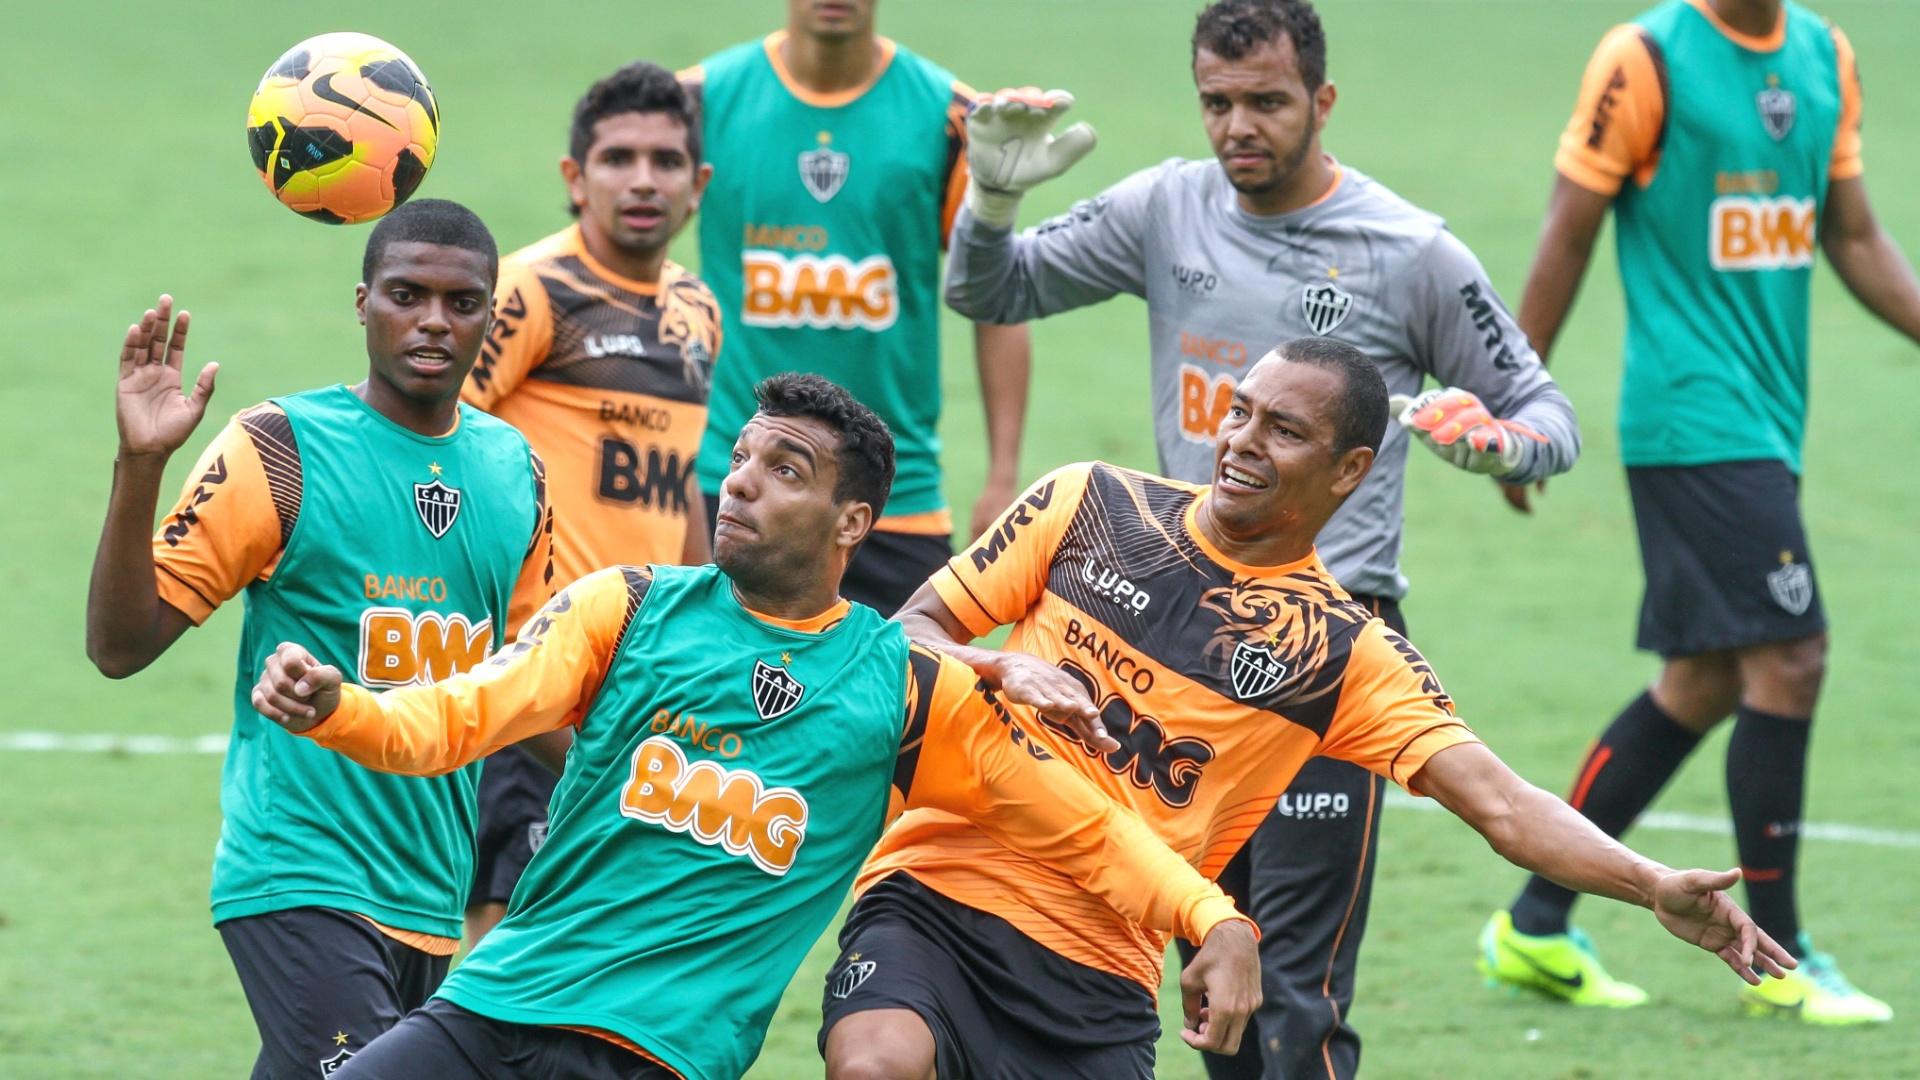 Gilberto Silva participa de treino do Atlético-MG na Cidade do Galo (8/11/2013)